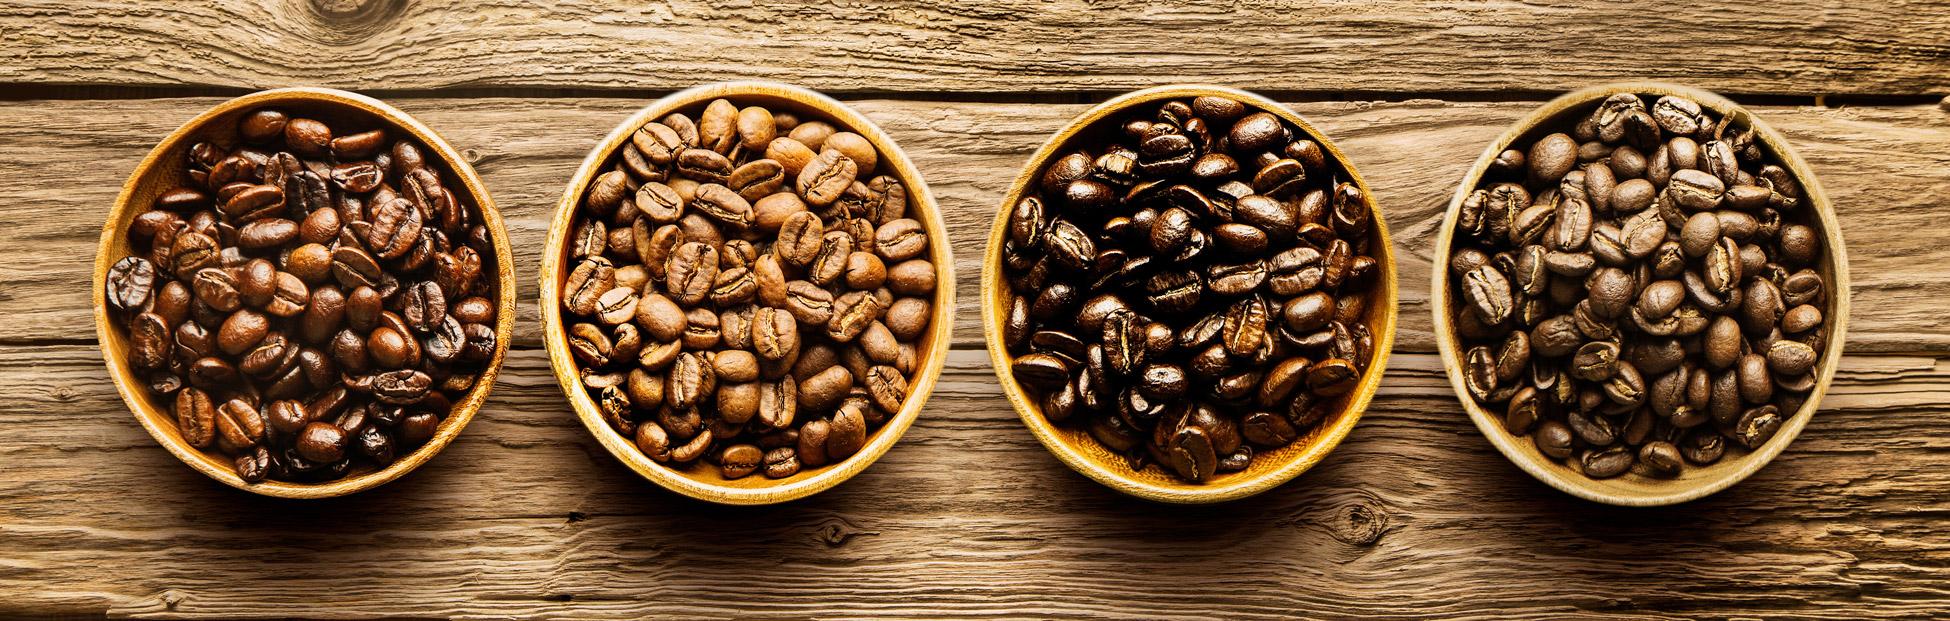 Variété de café